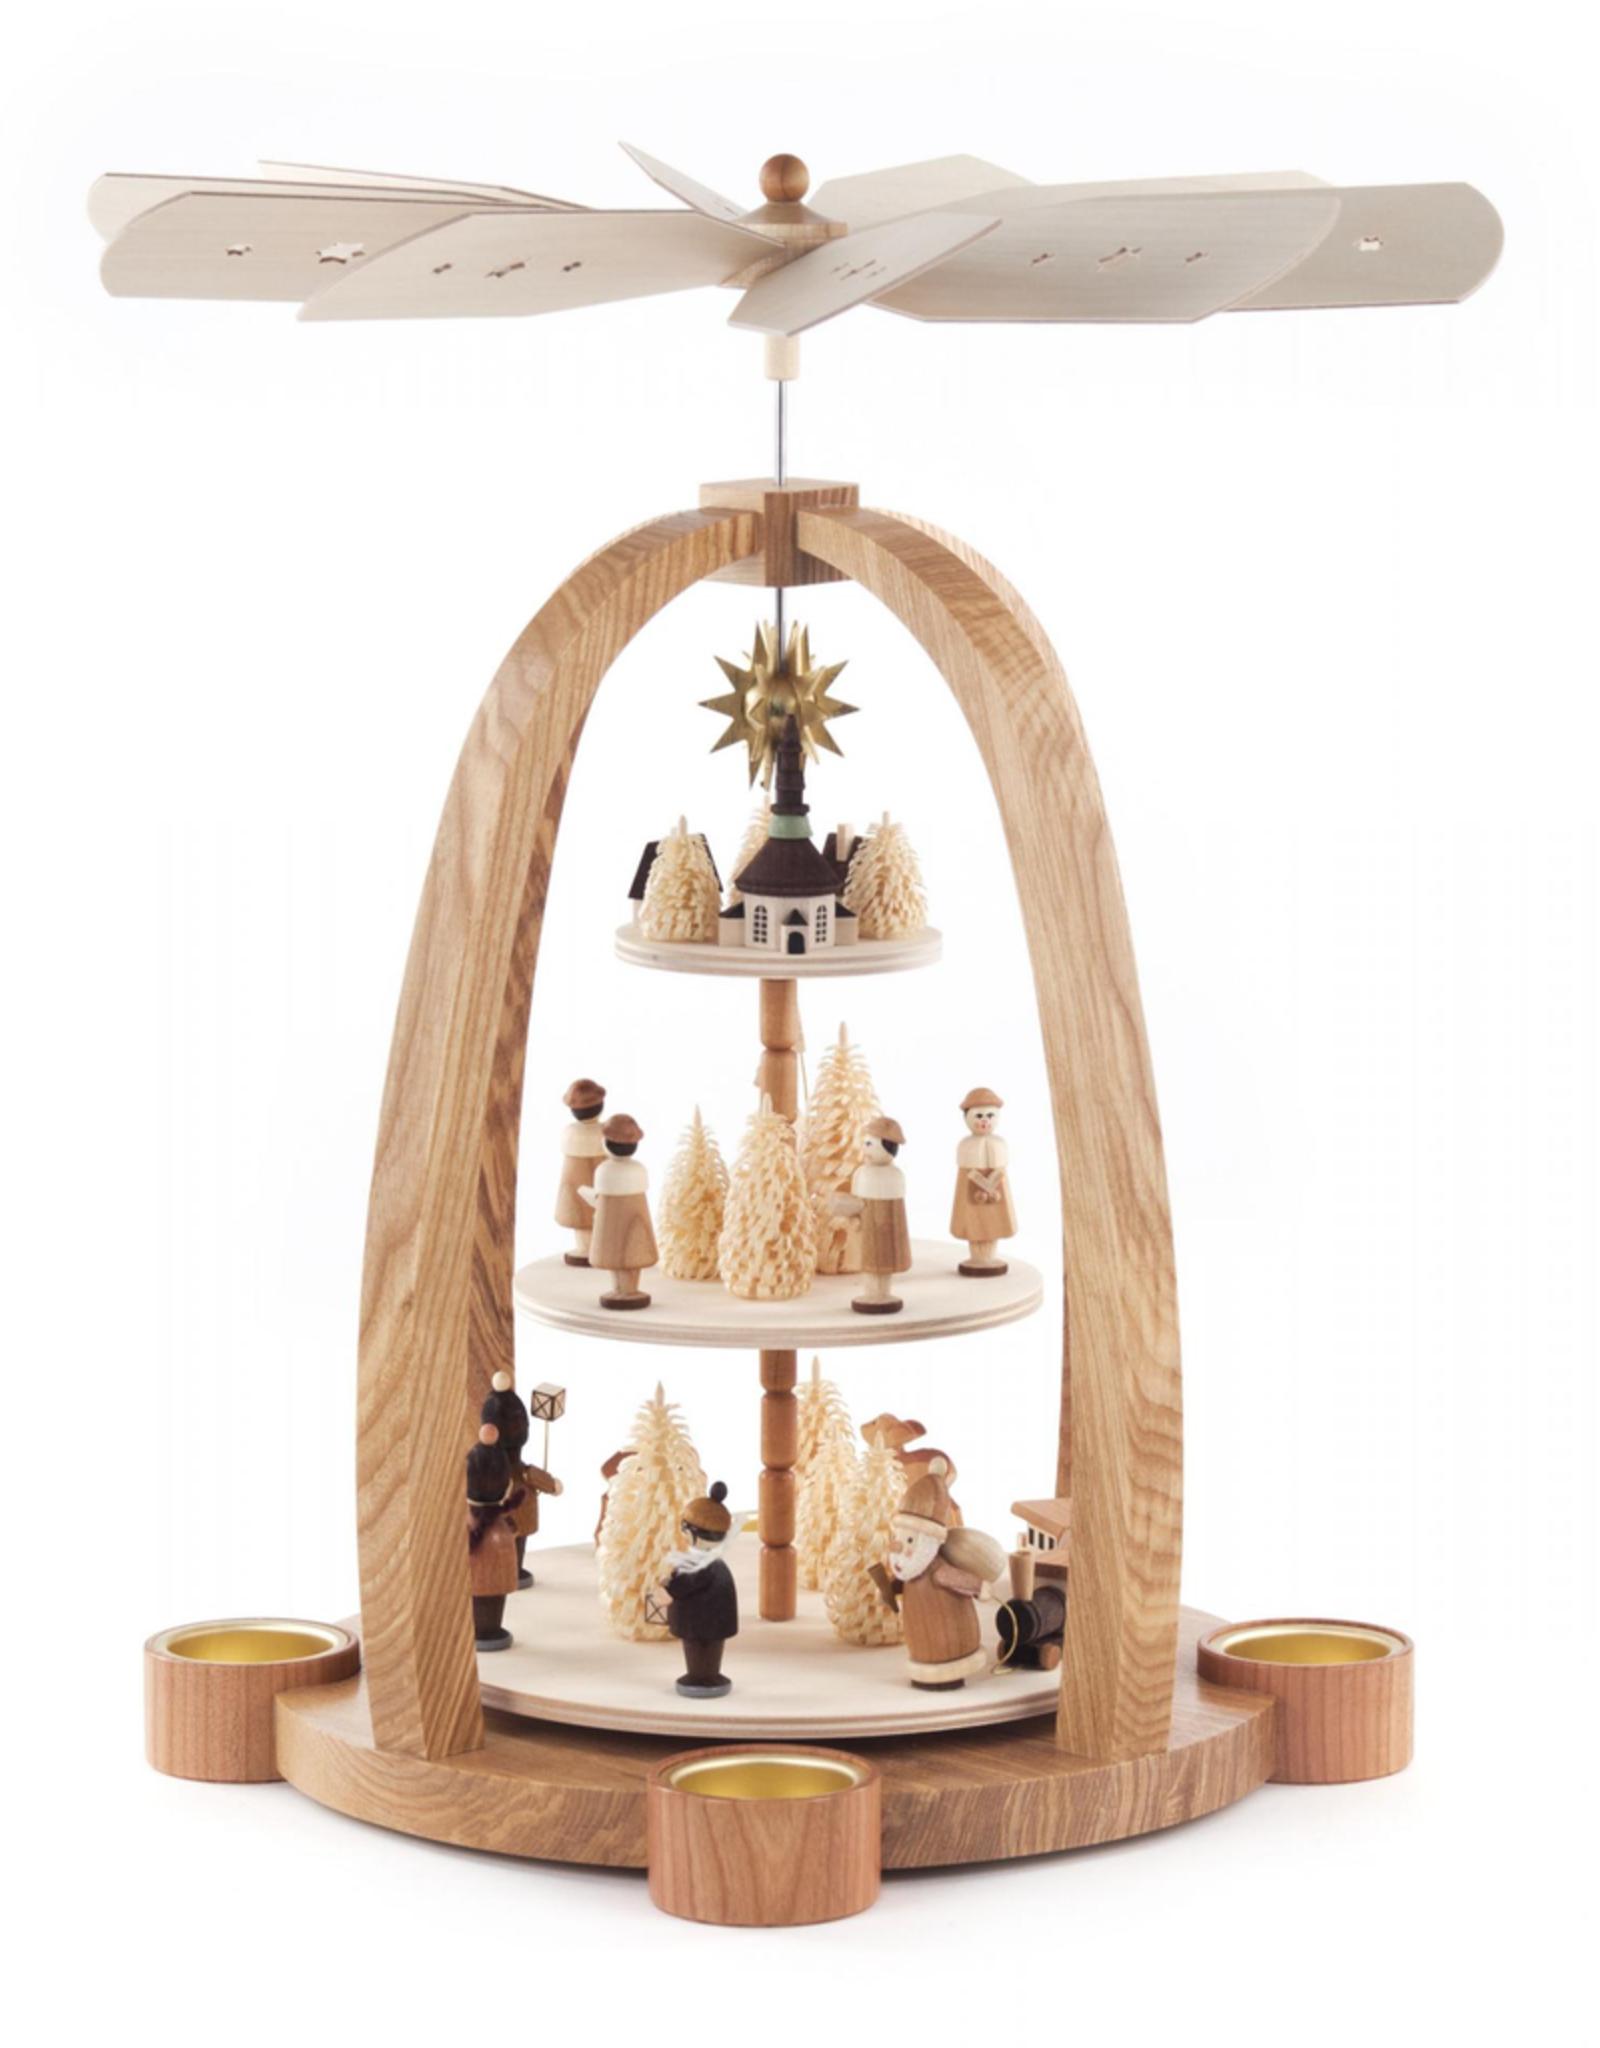 Christmas Pyramid, 3 Tier for Tealights. 40 cm